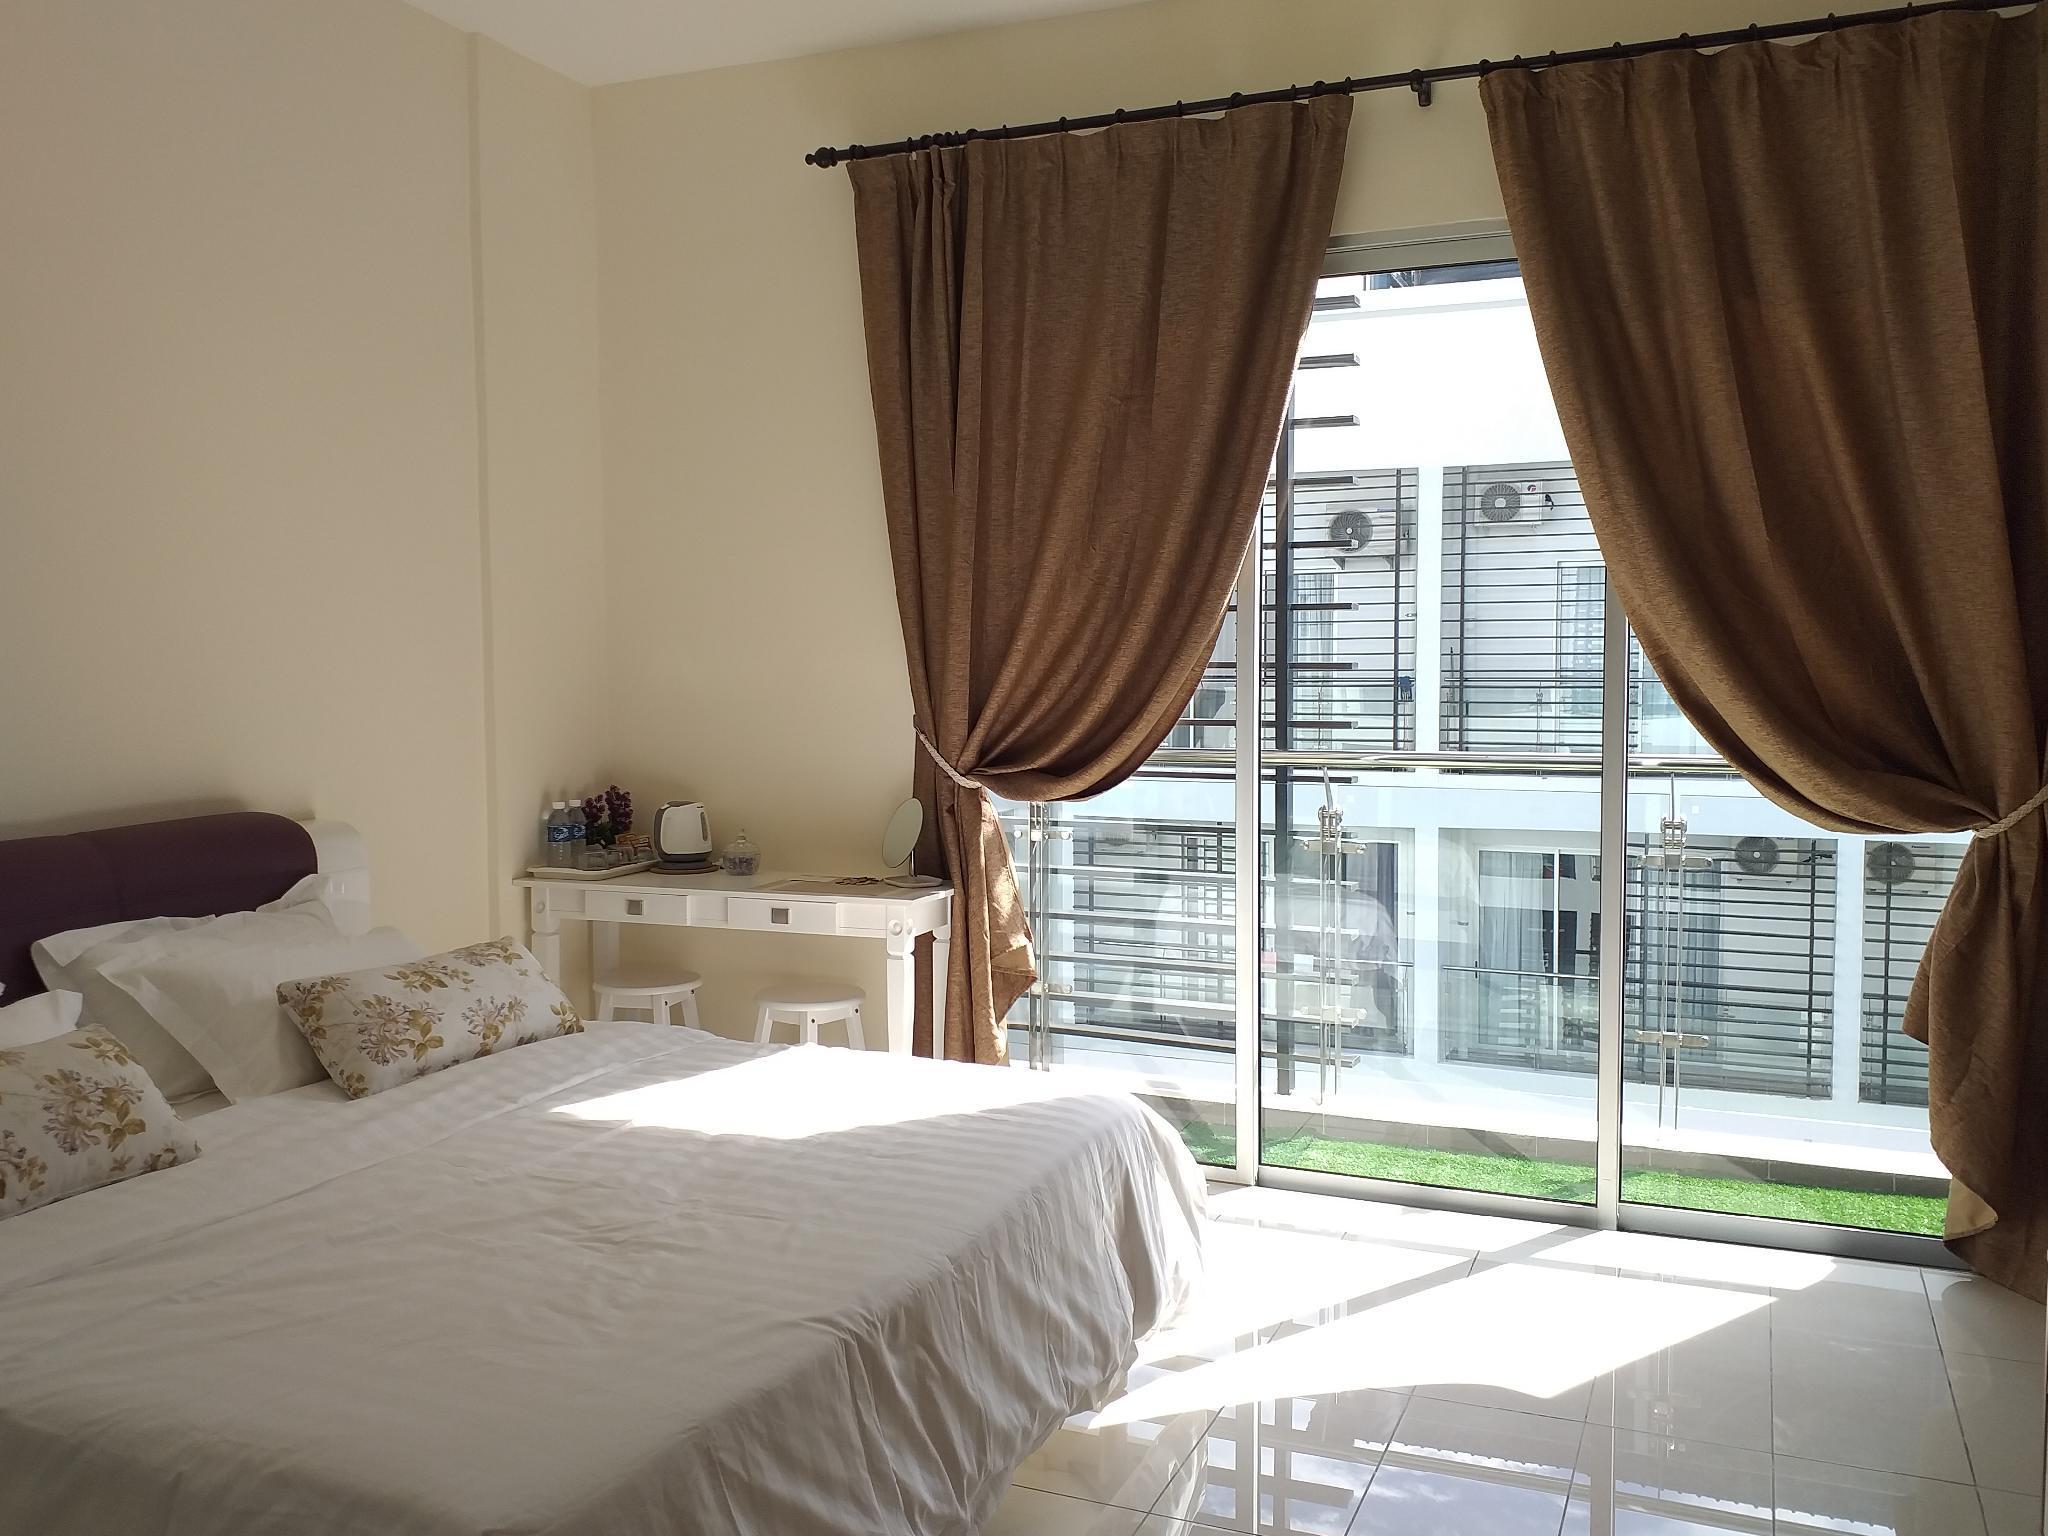 Aeropod Studio Suite 1 King Size Bed